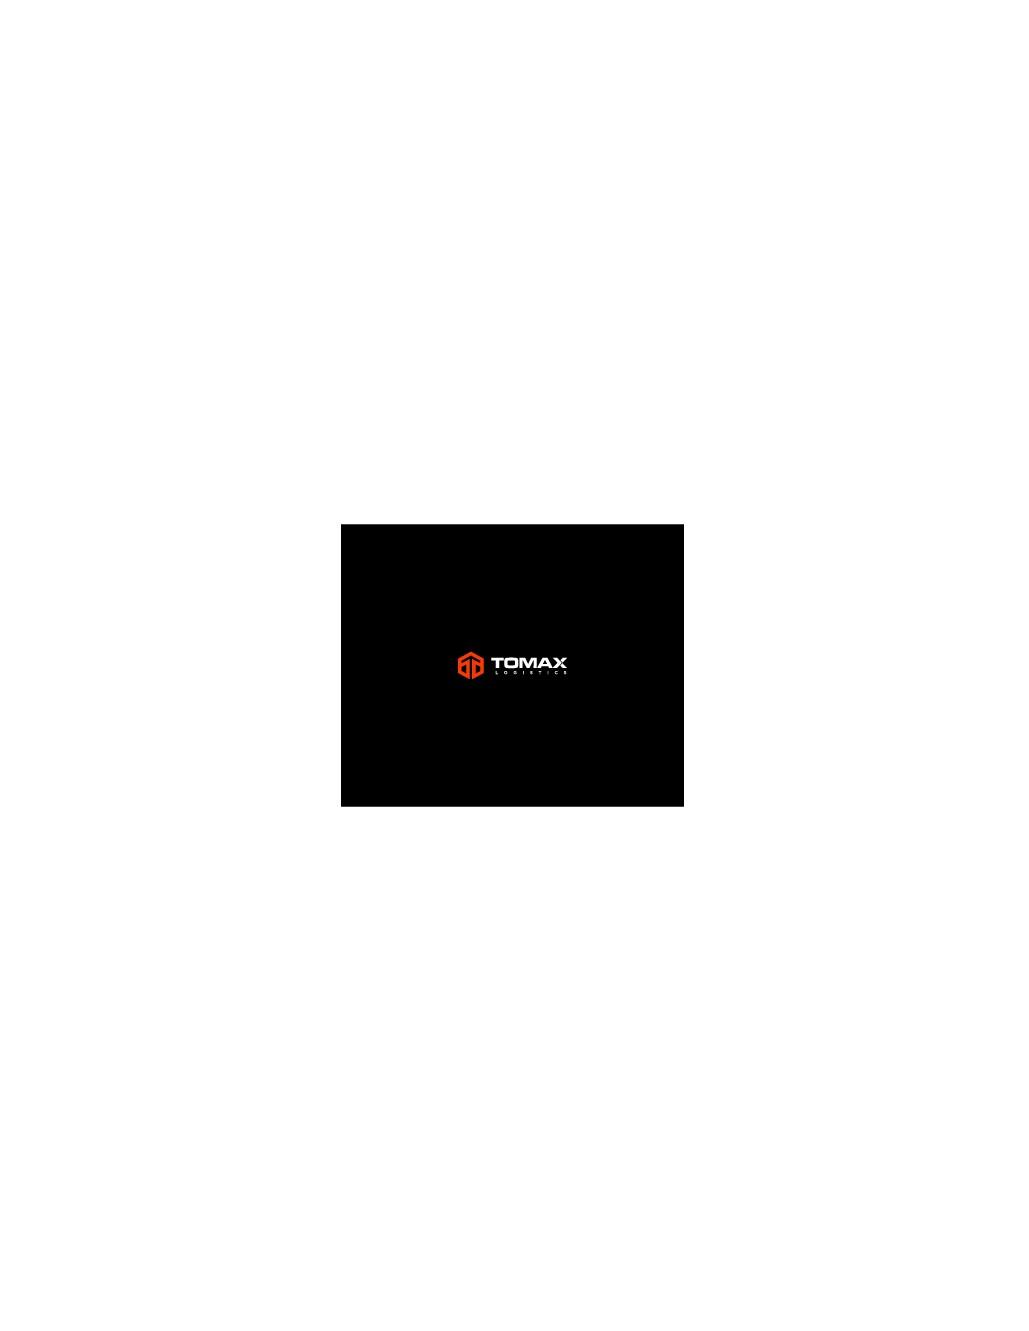 New Tomax Logo